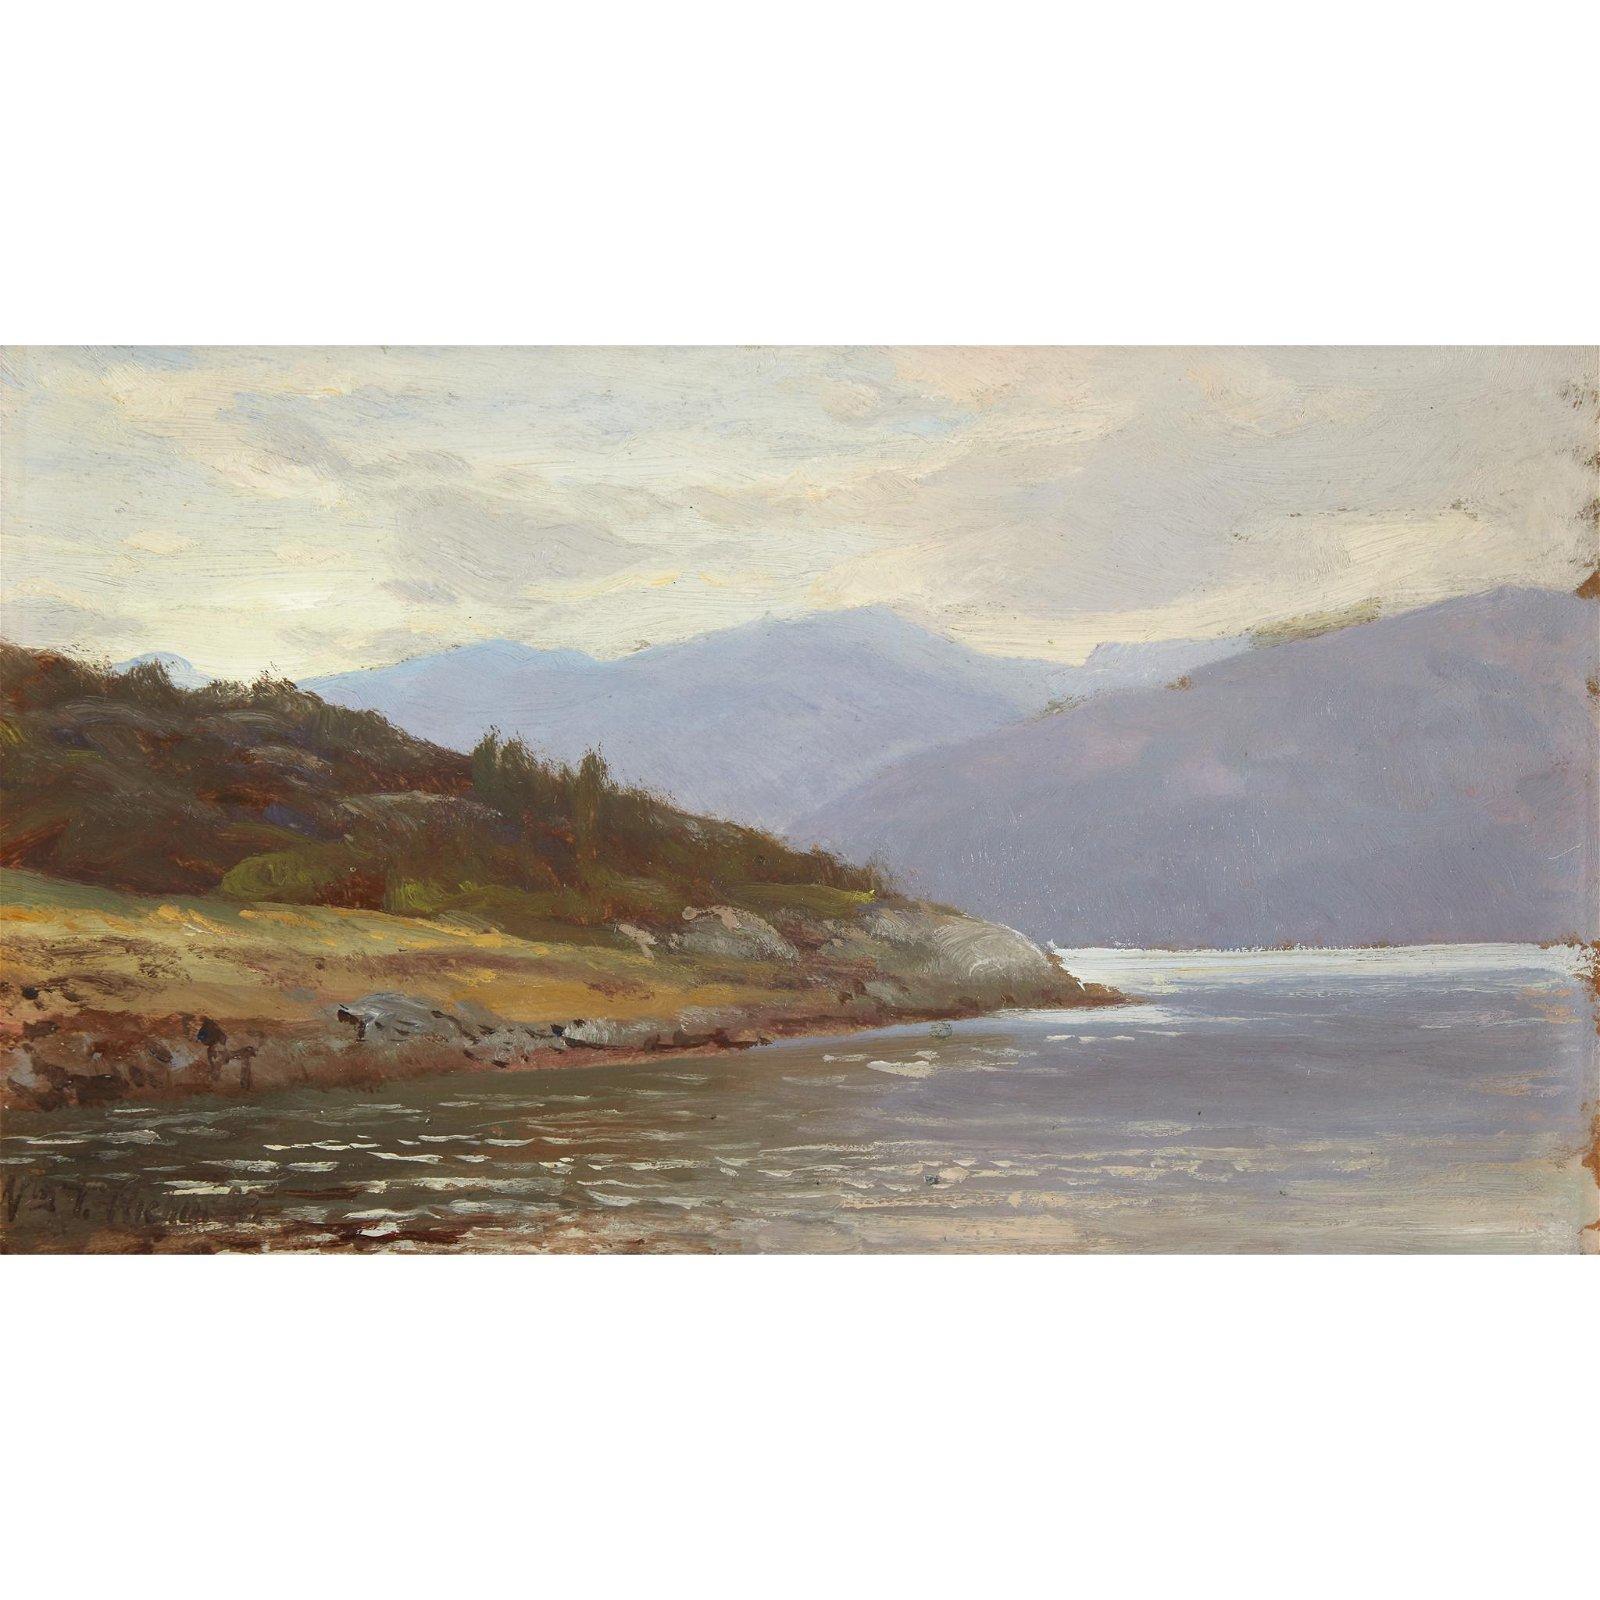 William Trost Richards (American, 1833-1905), , Looking